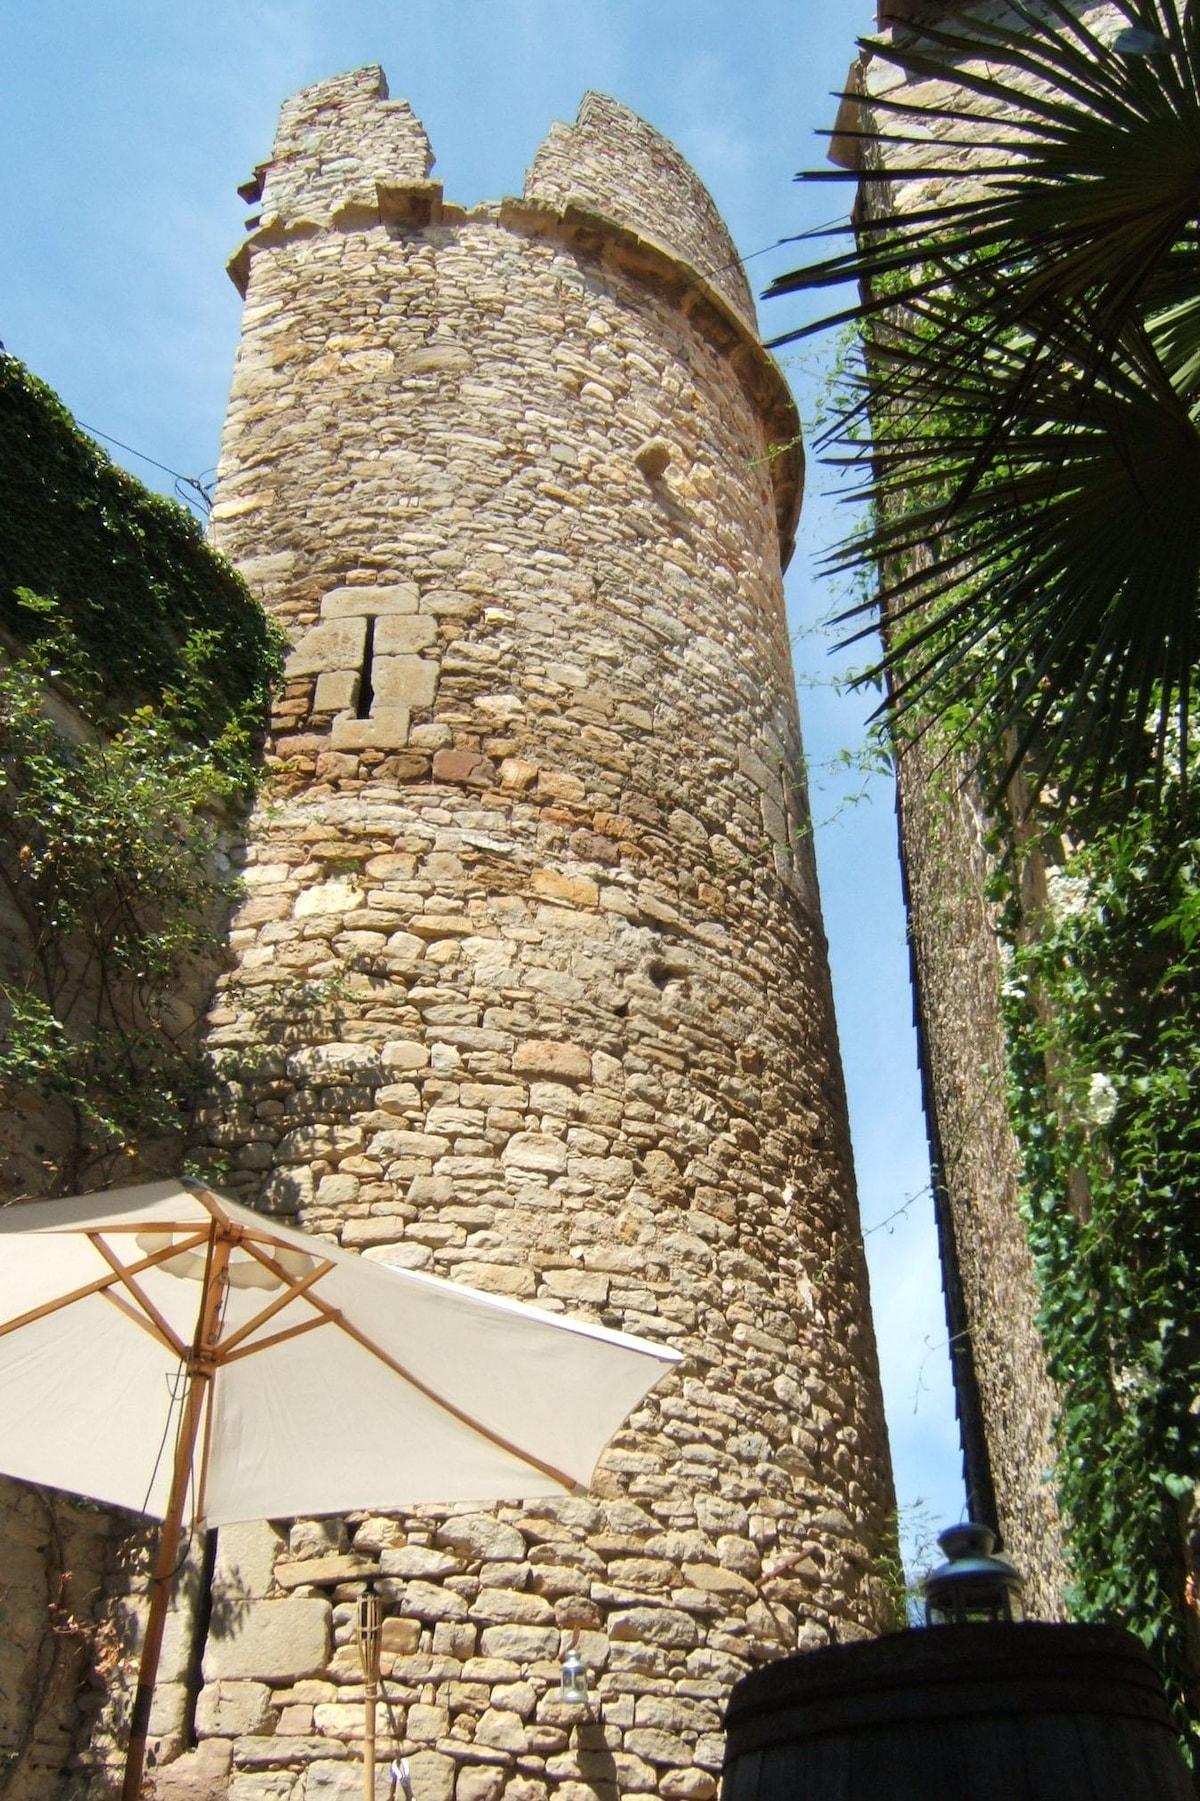 Gite La Tour - medieval and modern